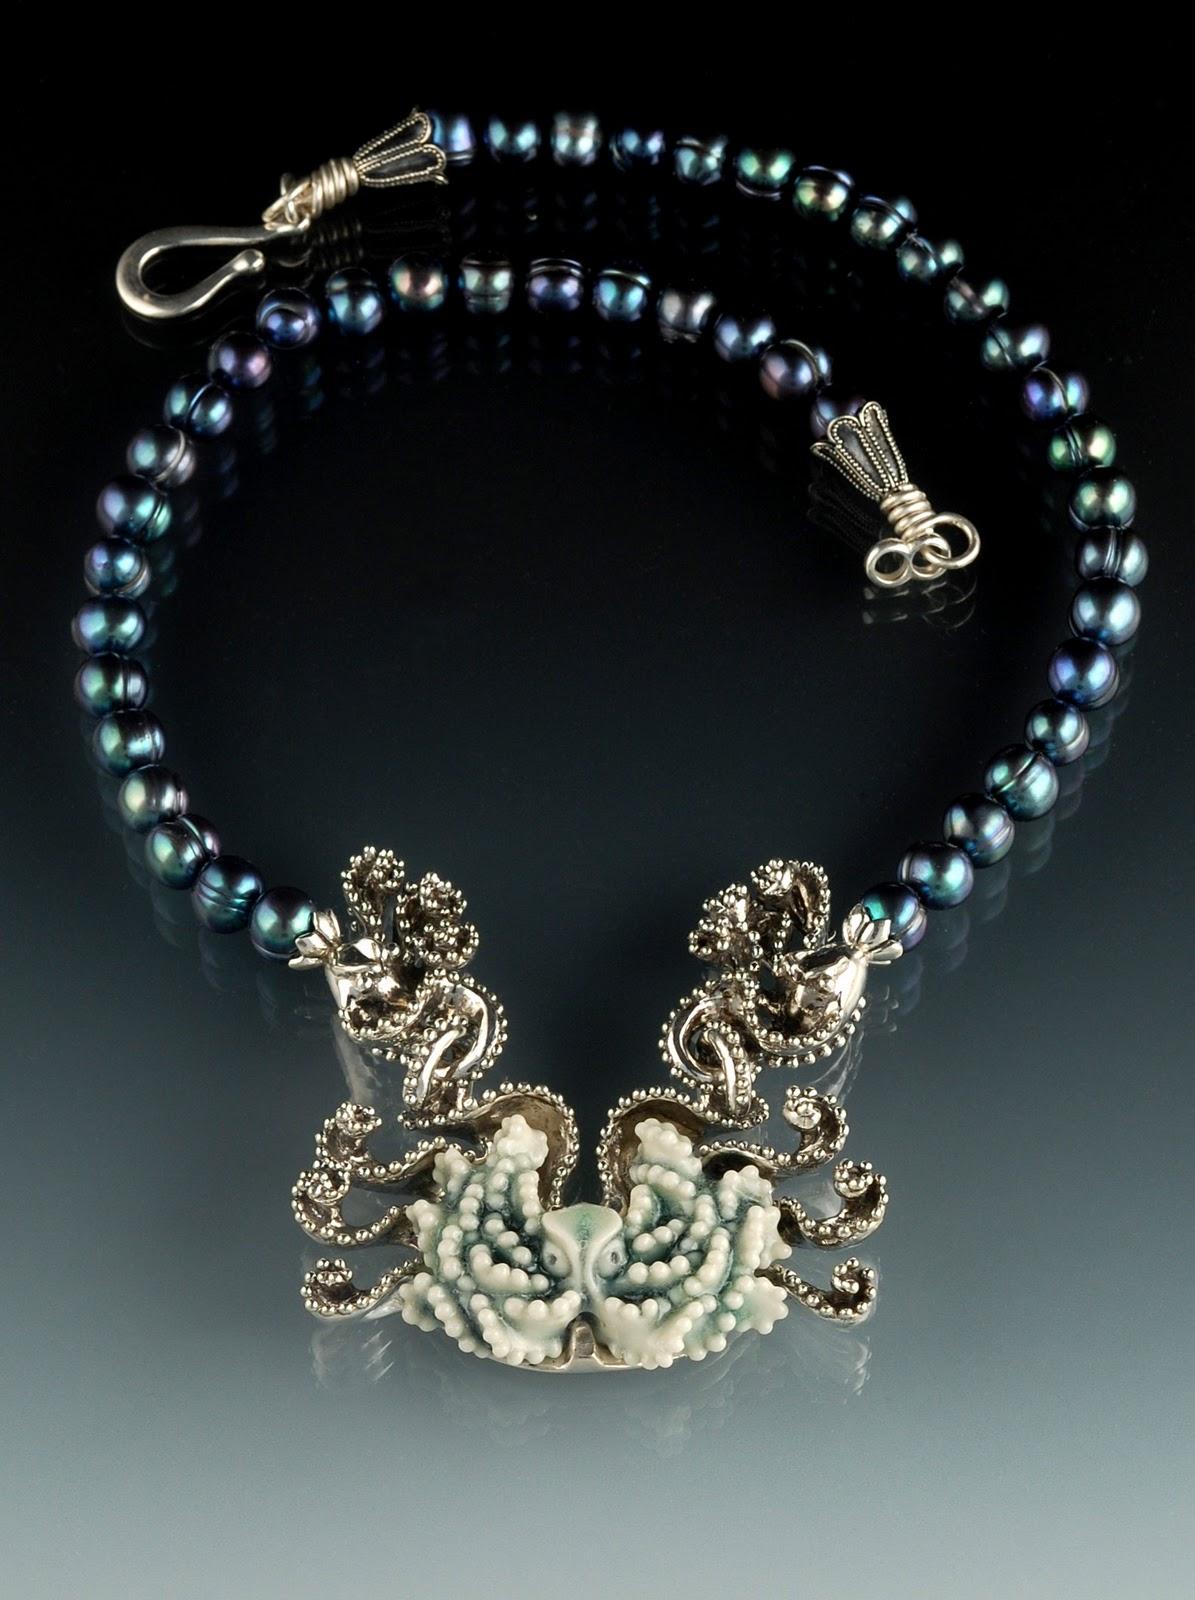 04_octopus_necklace_jewelry.jpg